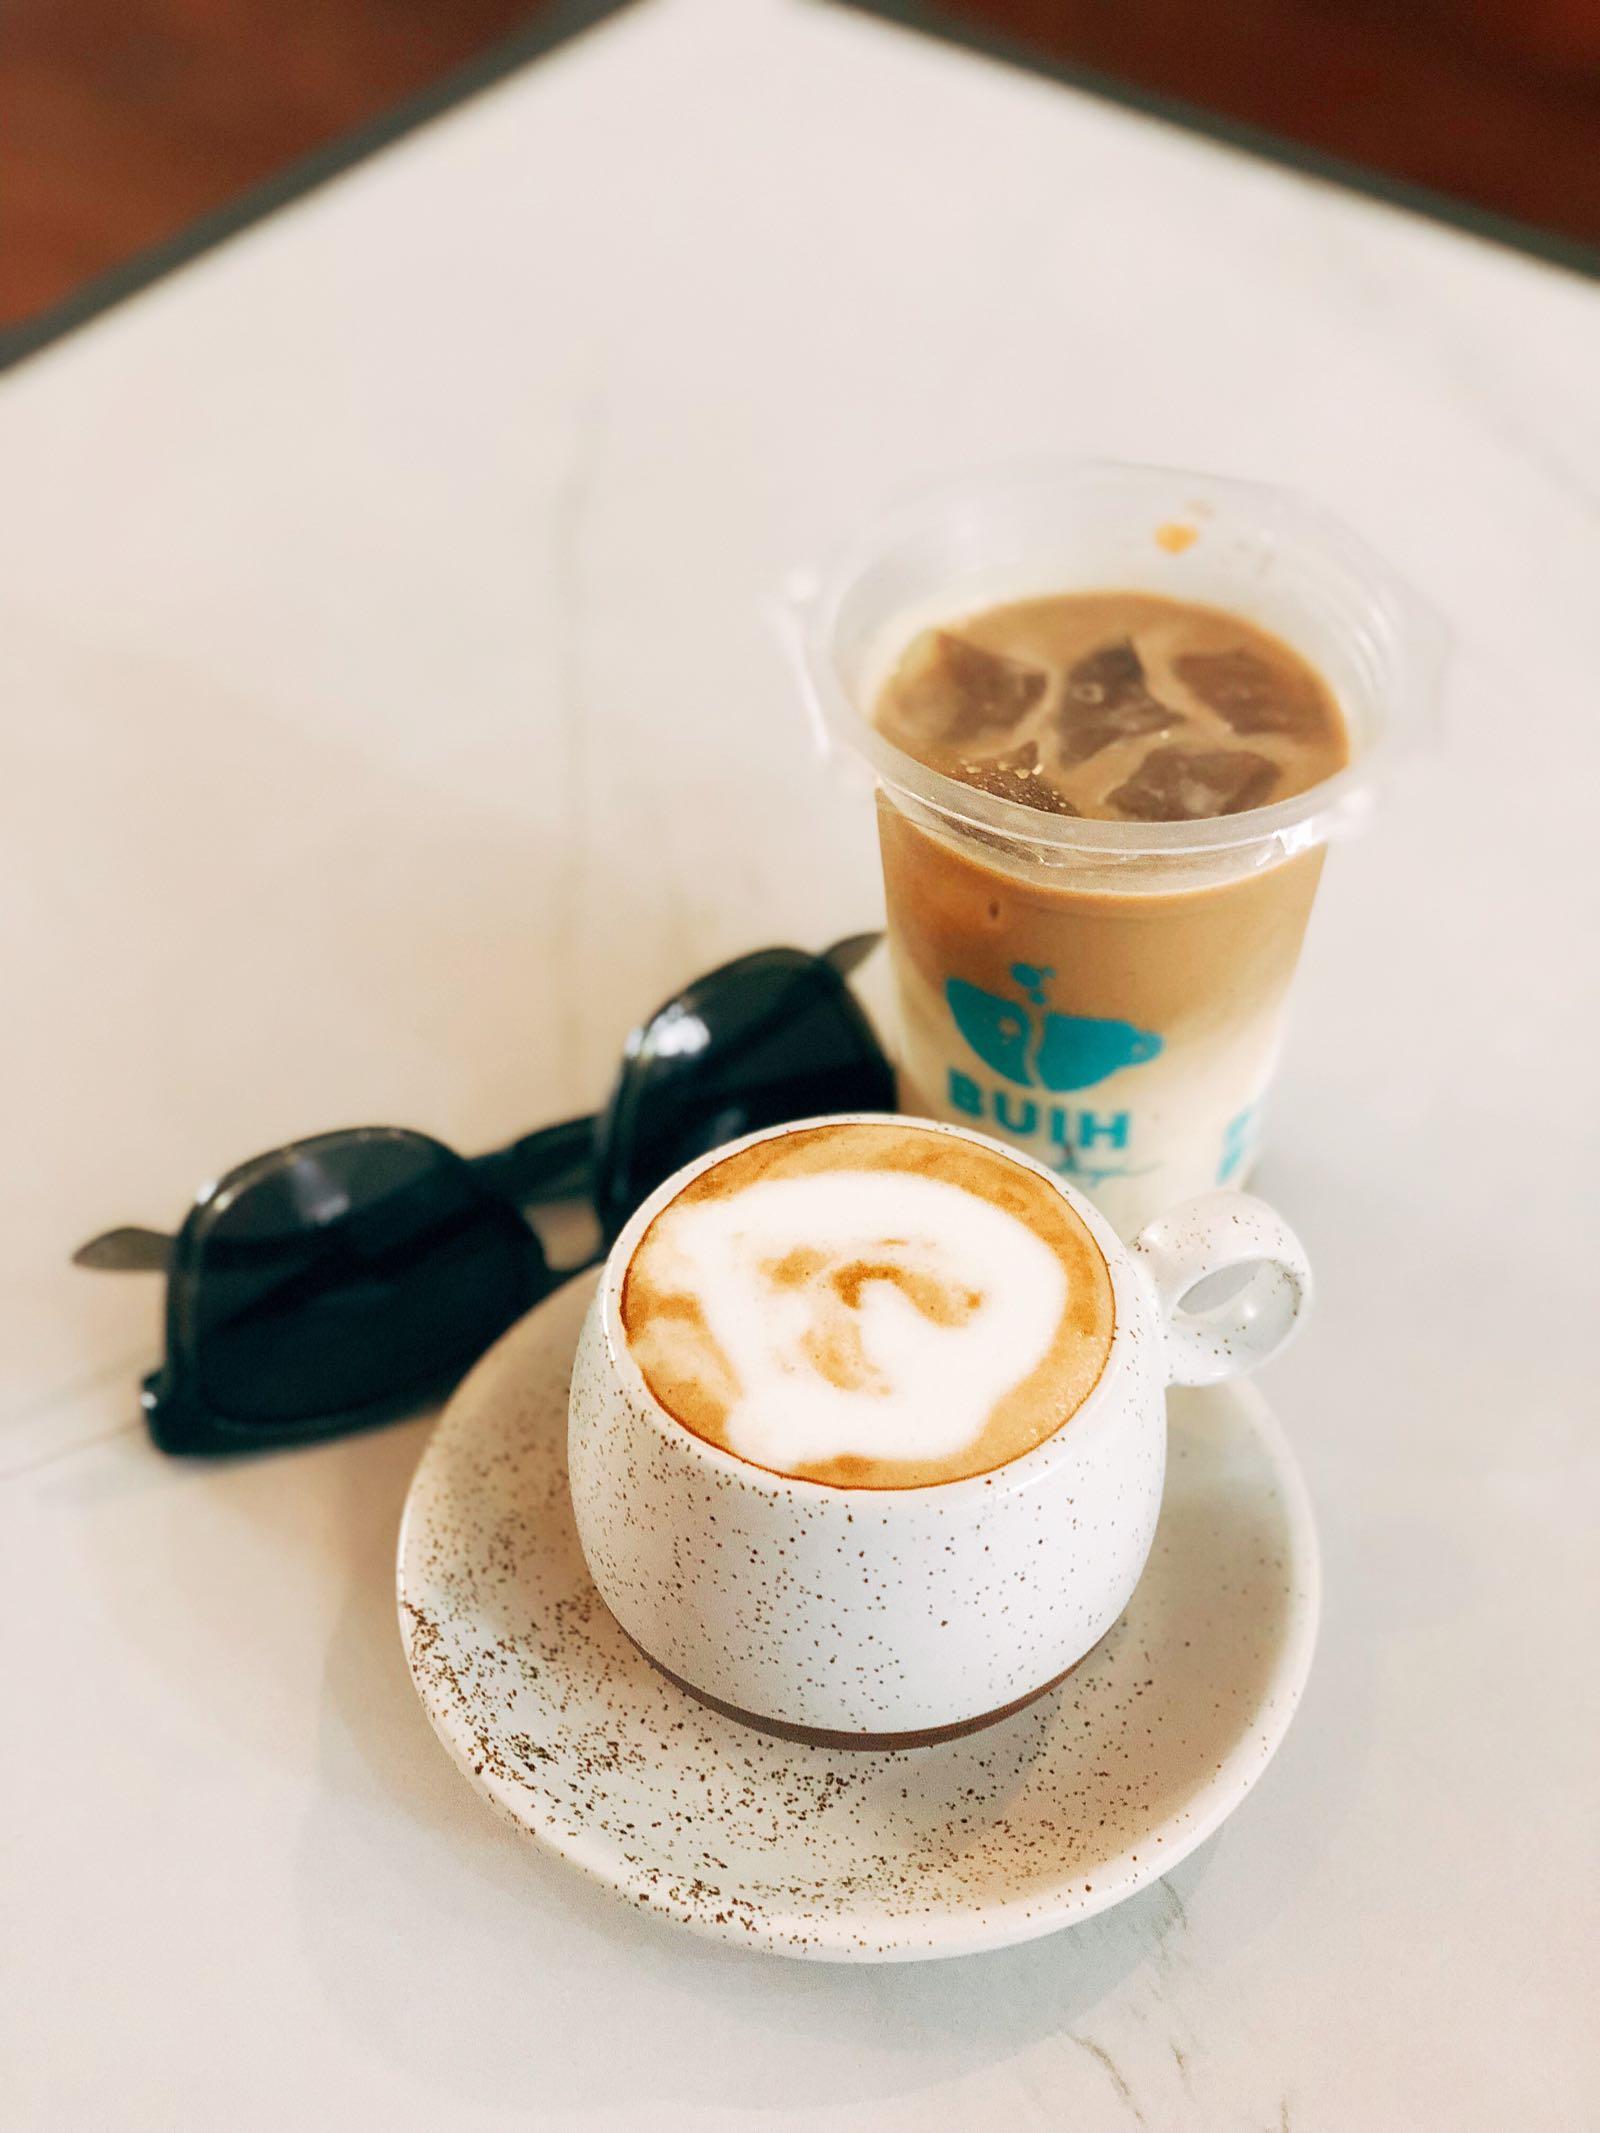 Buih Kopi Bandung Coffee